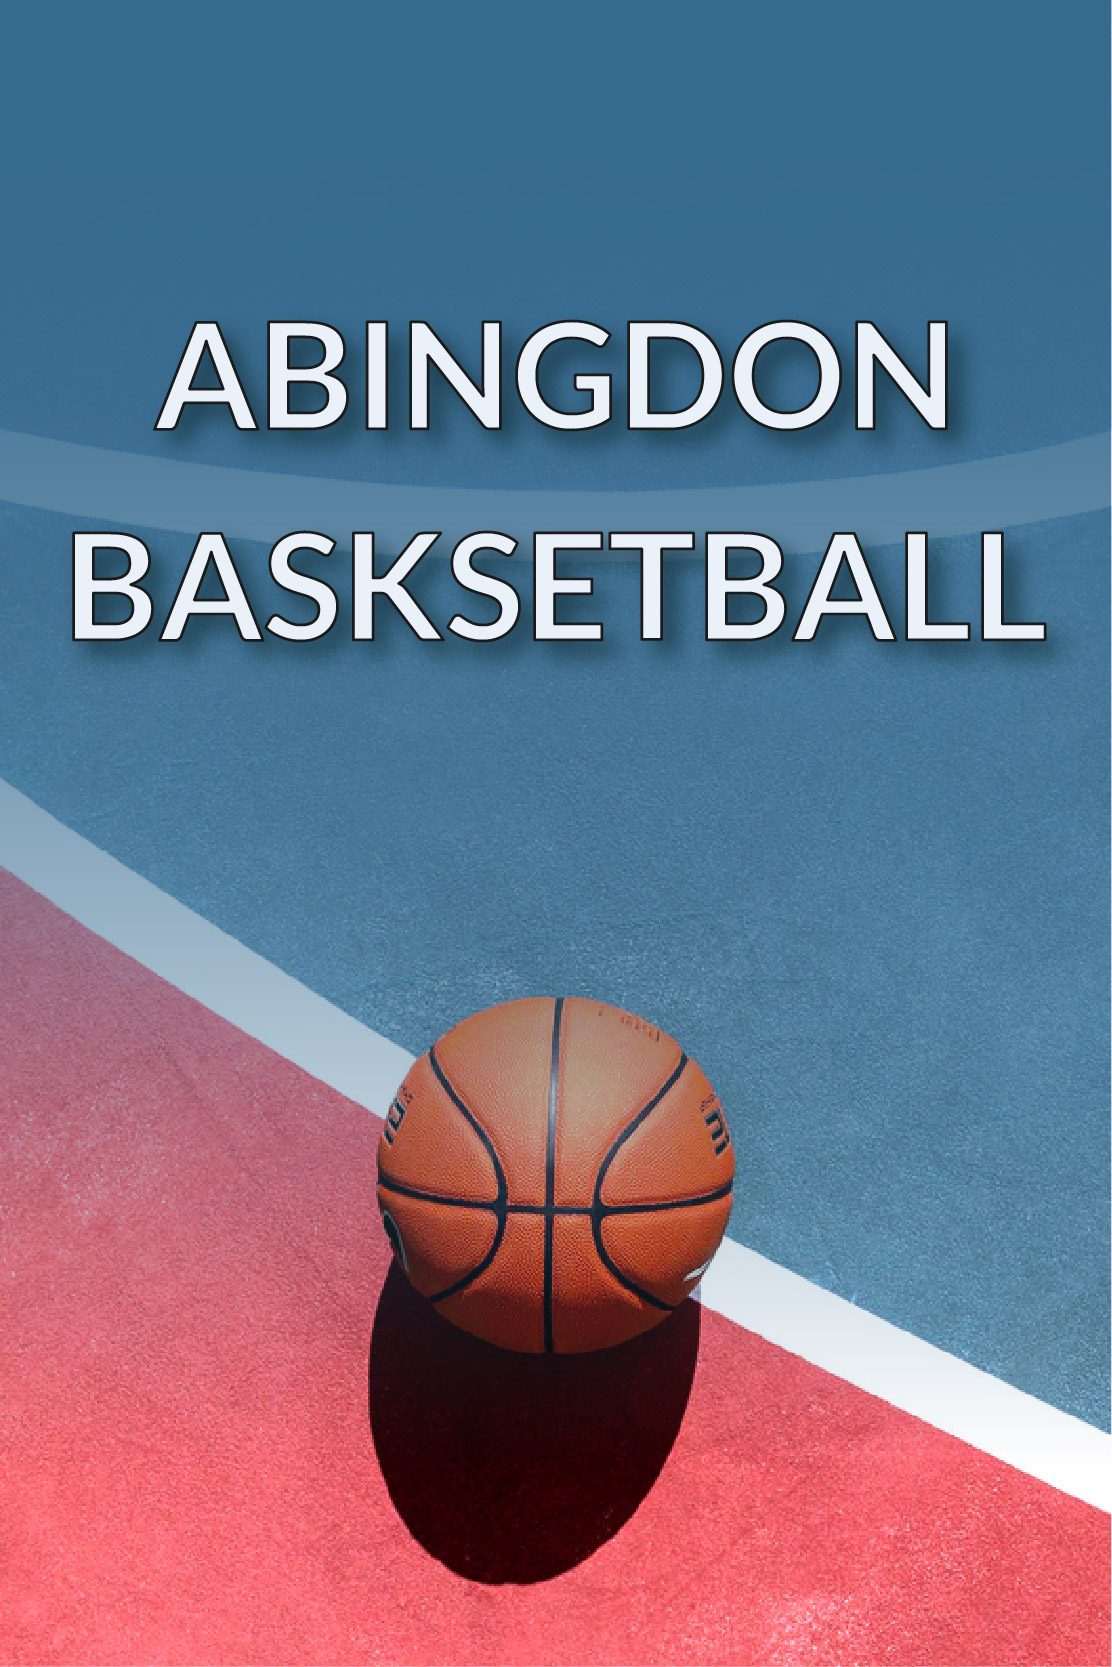 Poster for Abingdon Basketball